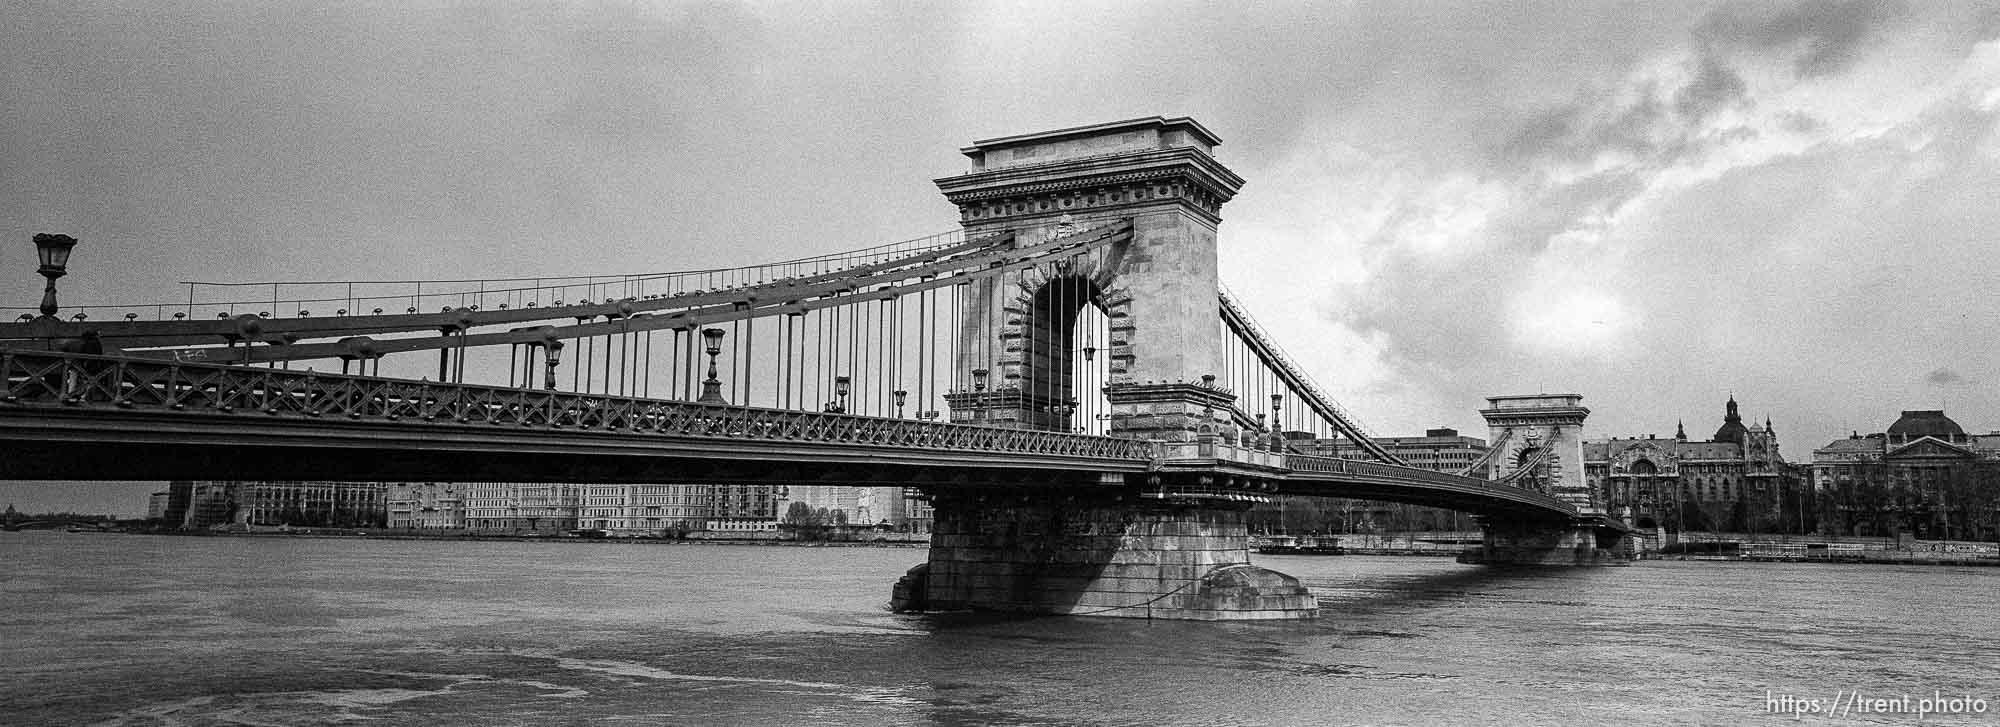 The Szechenyi bridge.